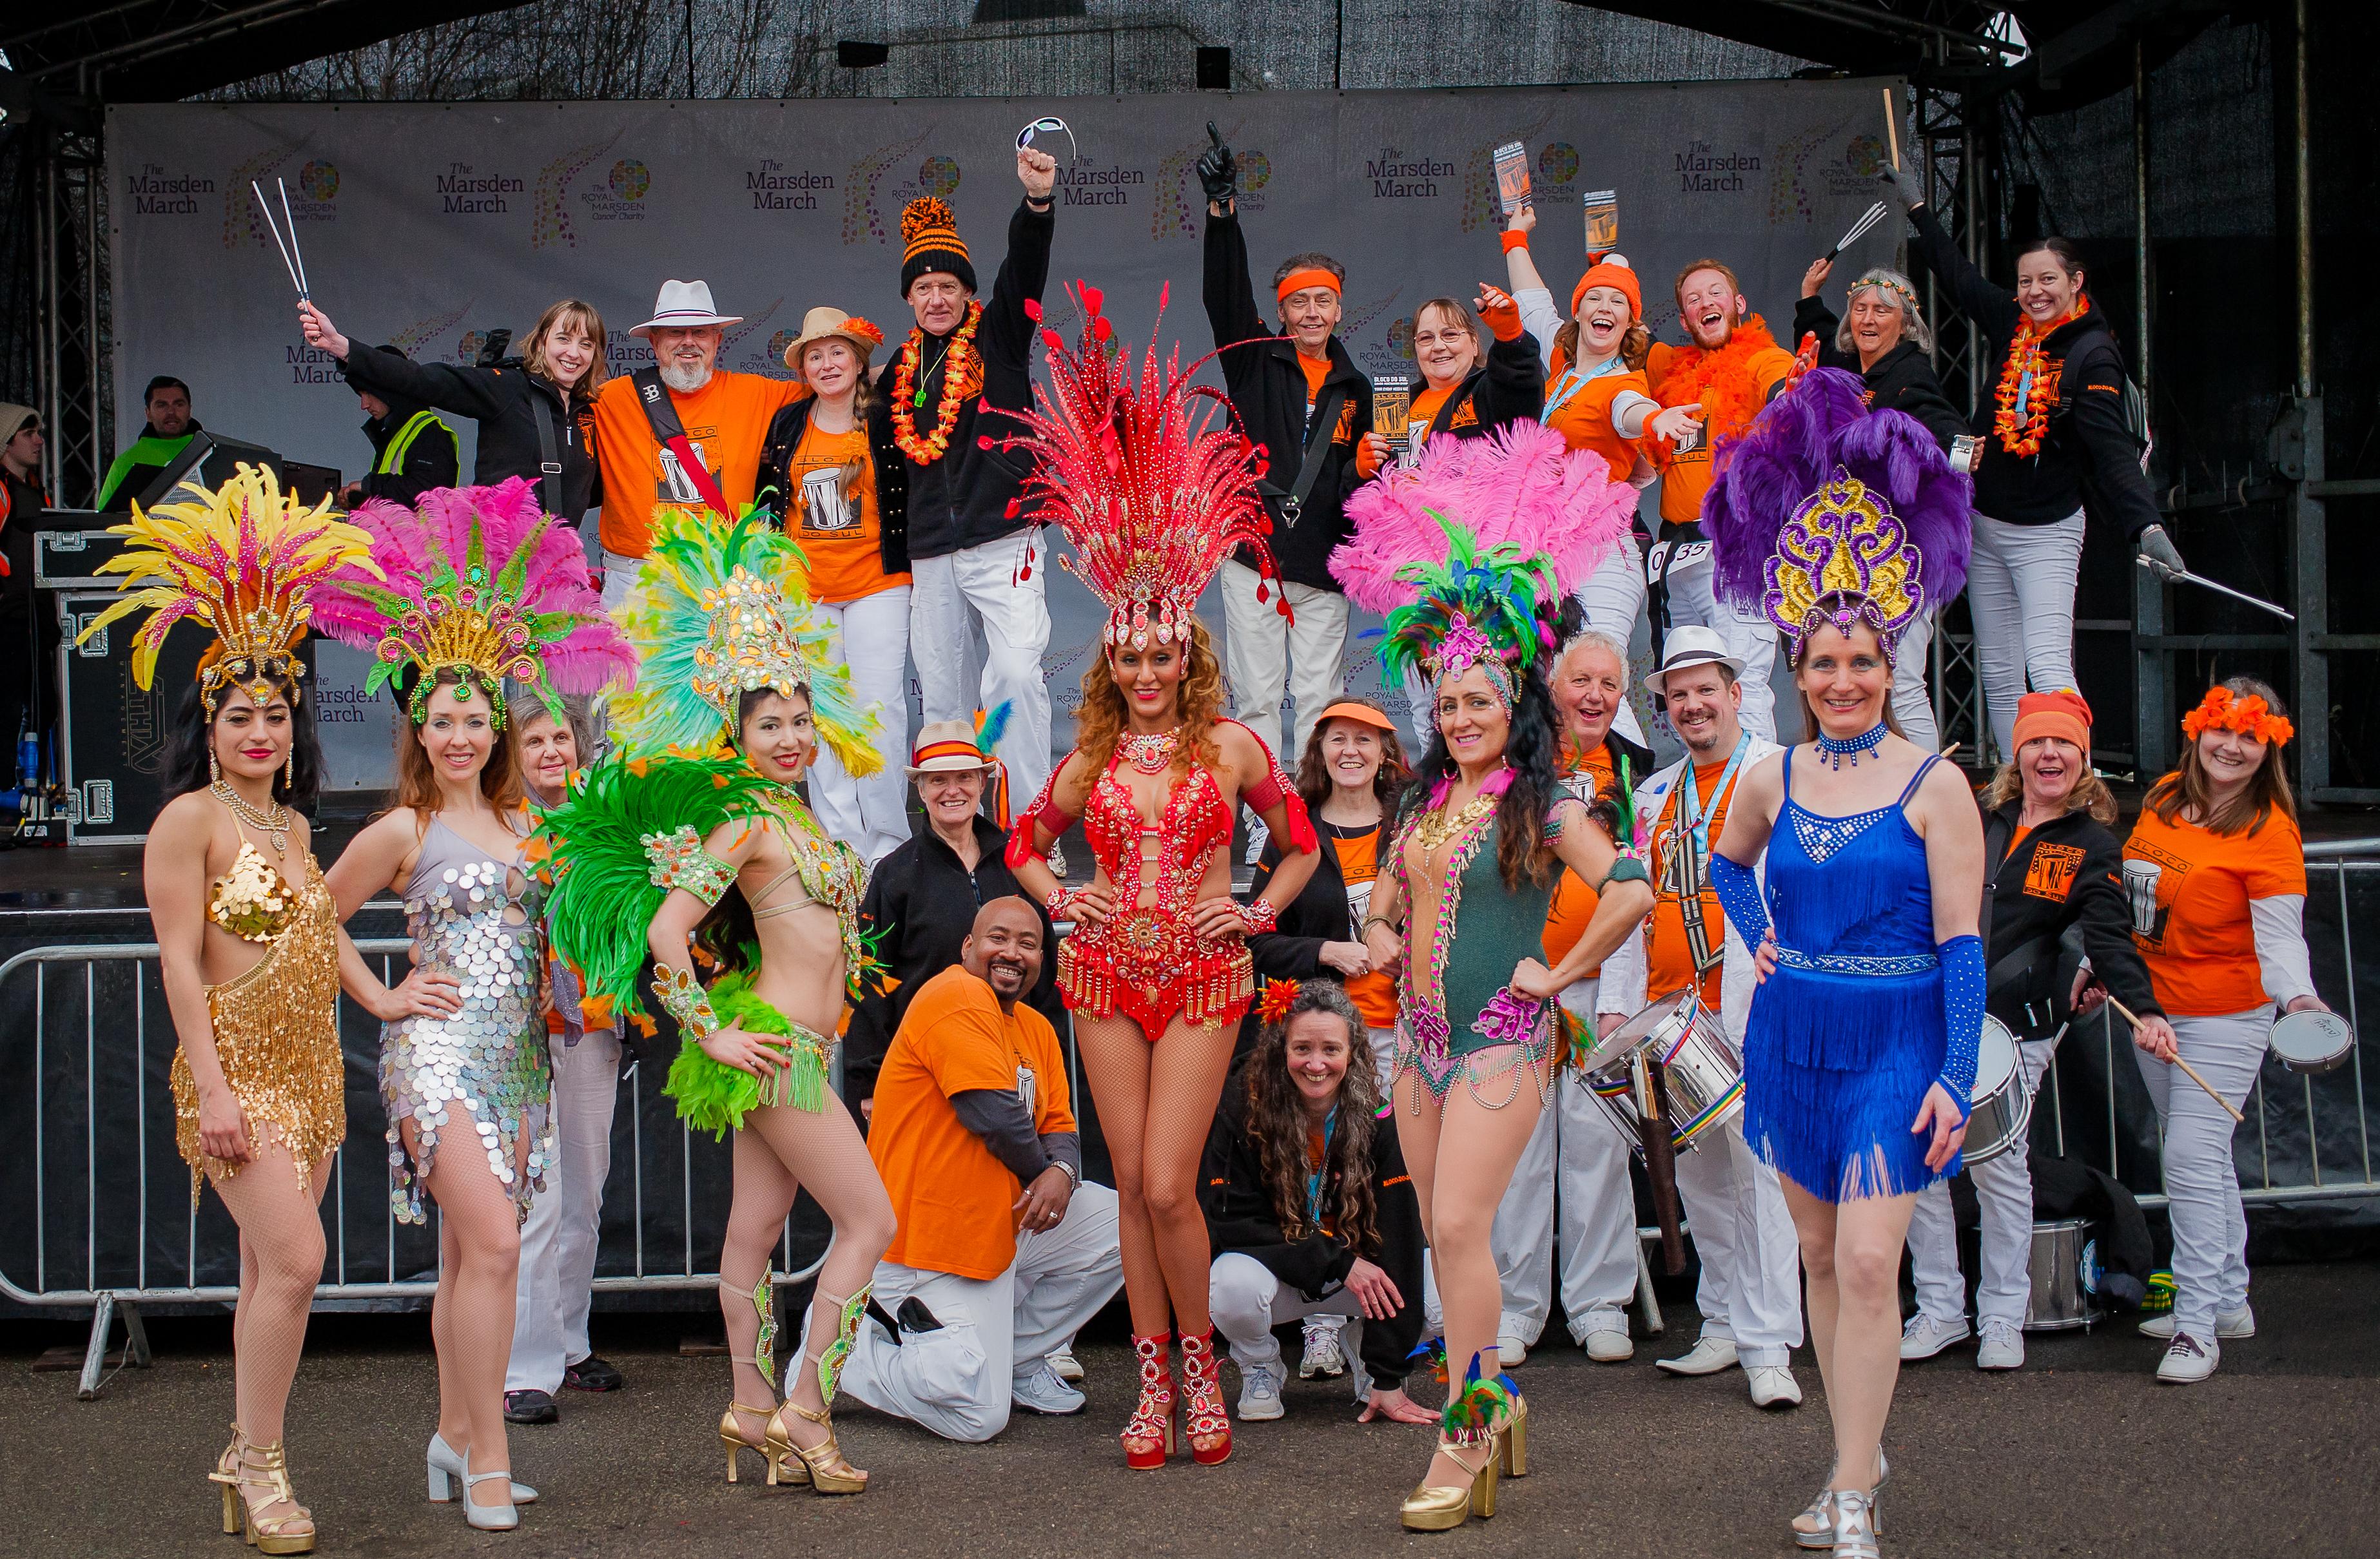 Marsden March 2018 Carnival Show